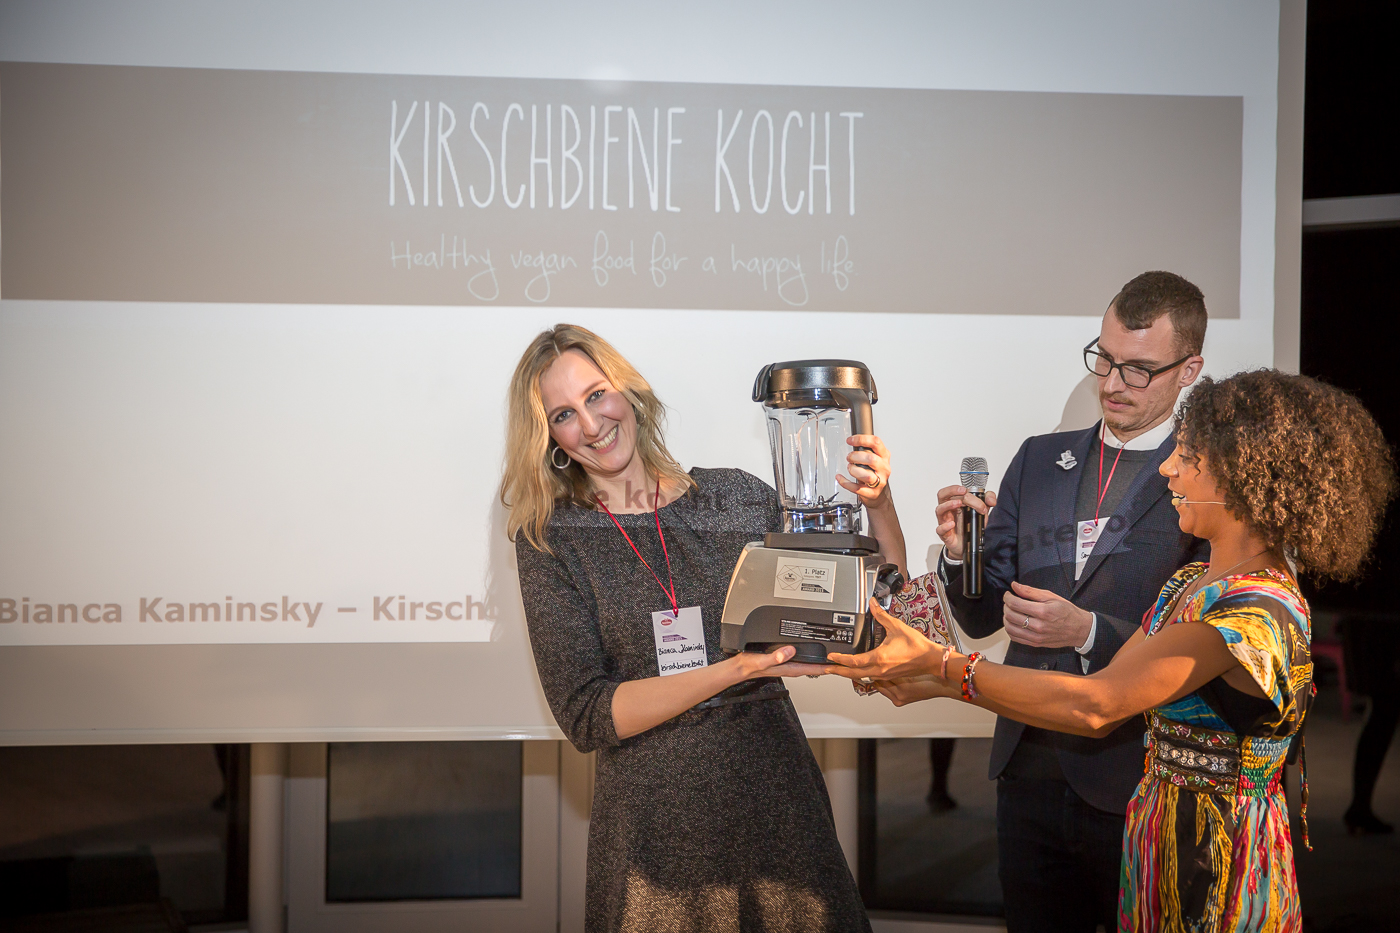 keimling award  Small72